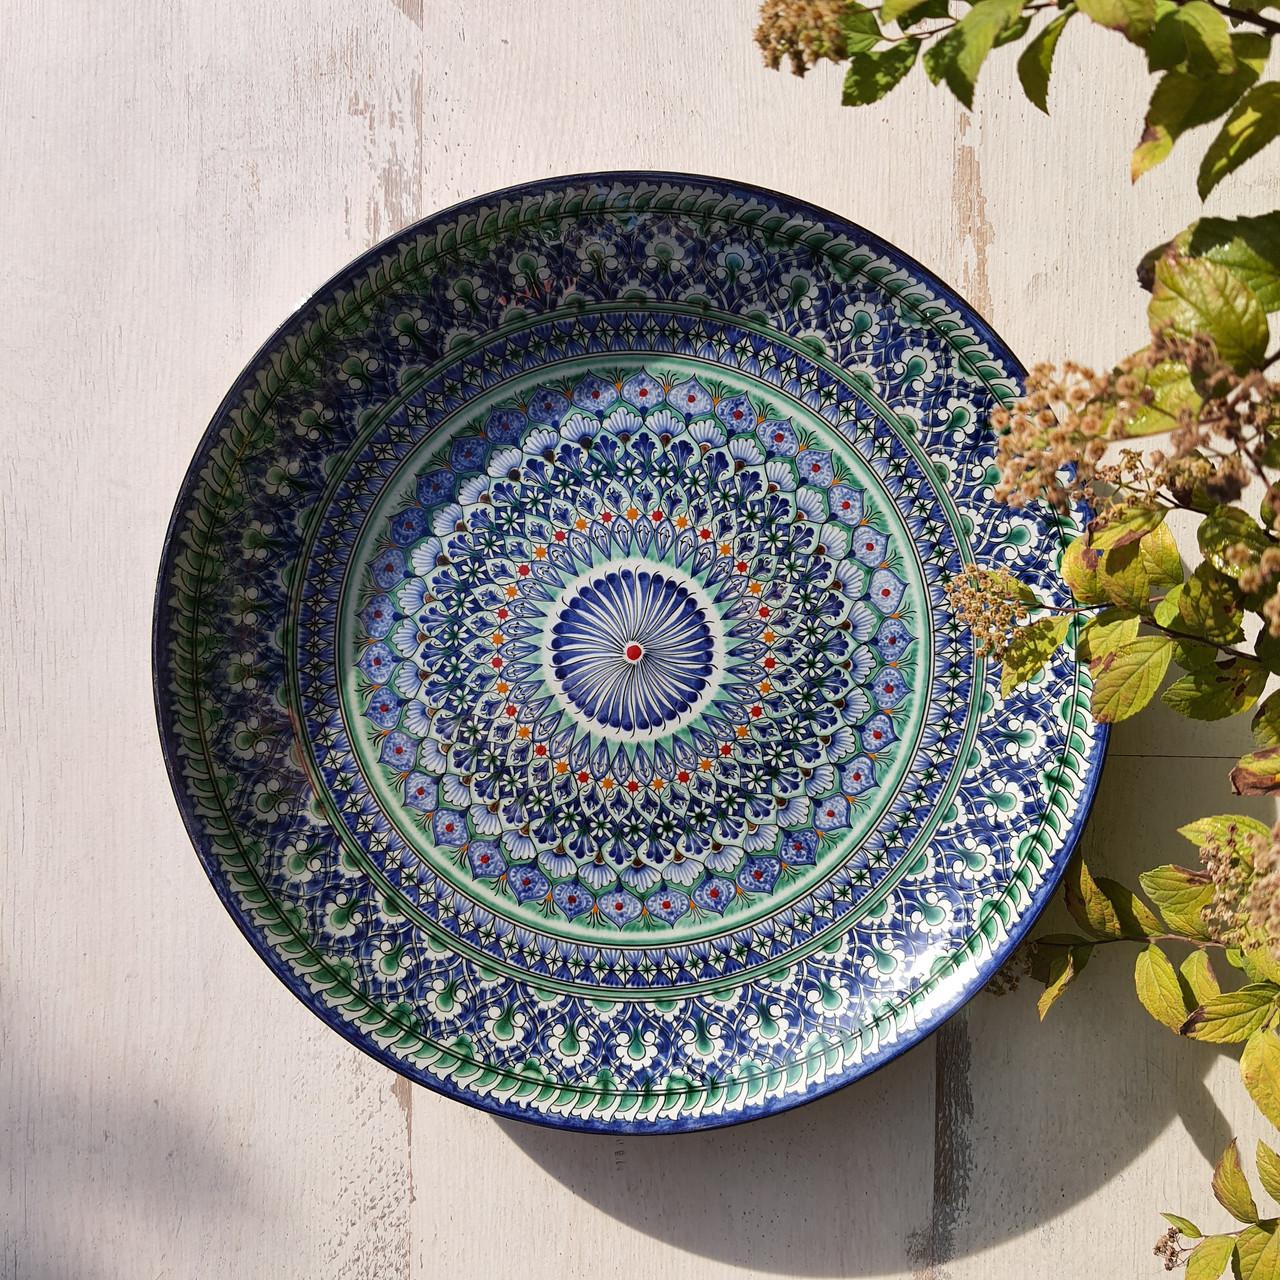 Тарелка для плова авторской росписи d 32 см. Узбекистан (133)